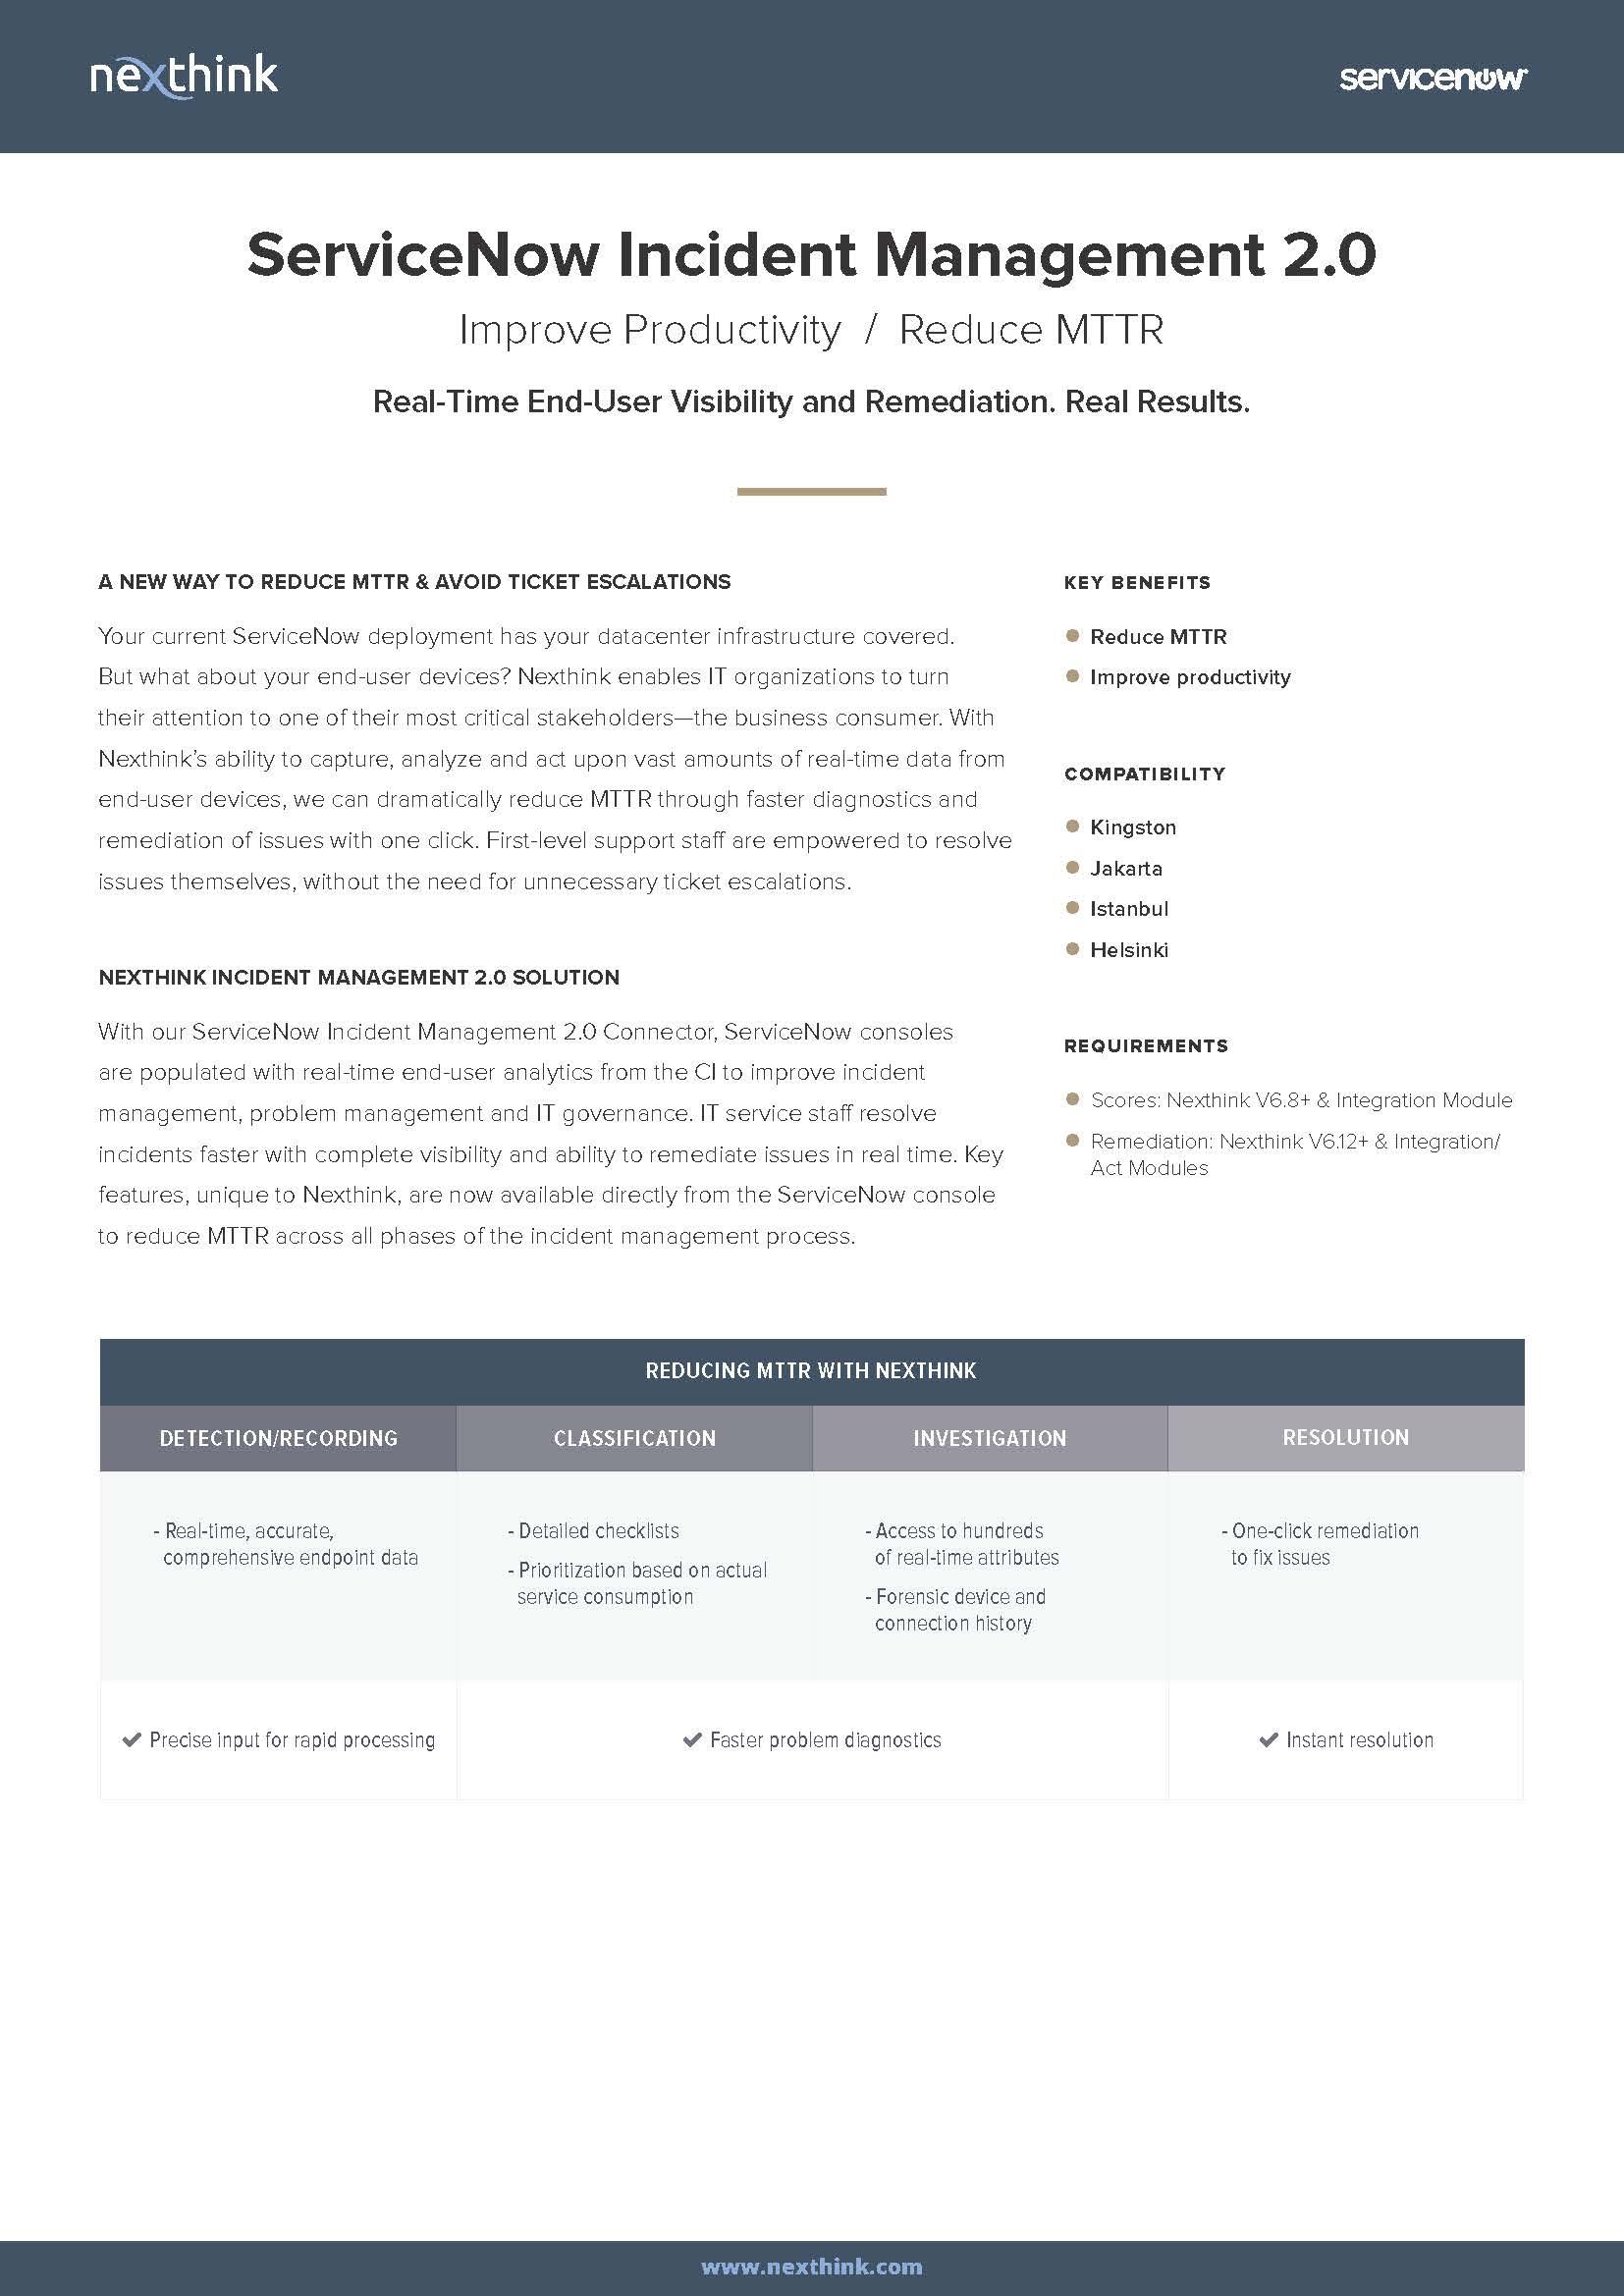 ServiceNow Incident Management 2.0 Fact Sheet